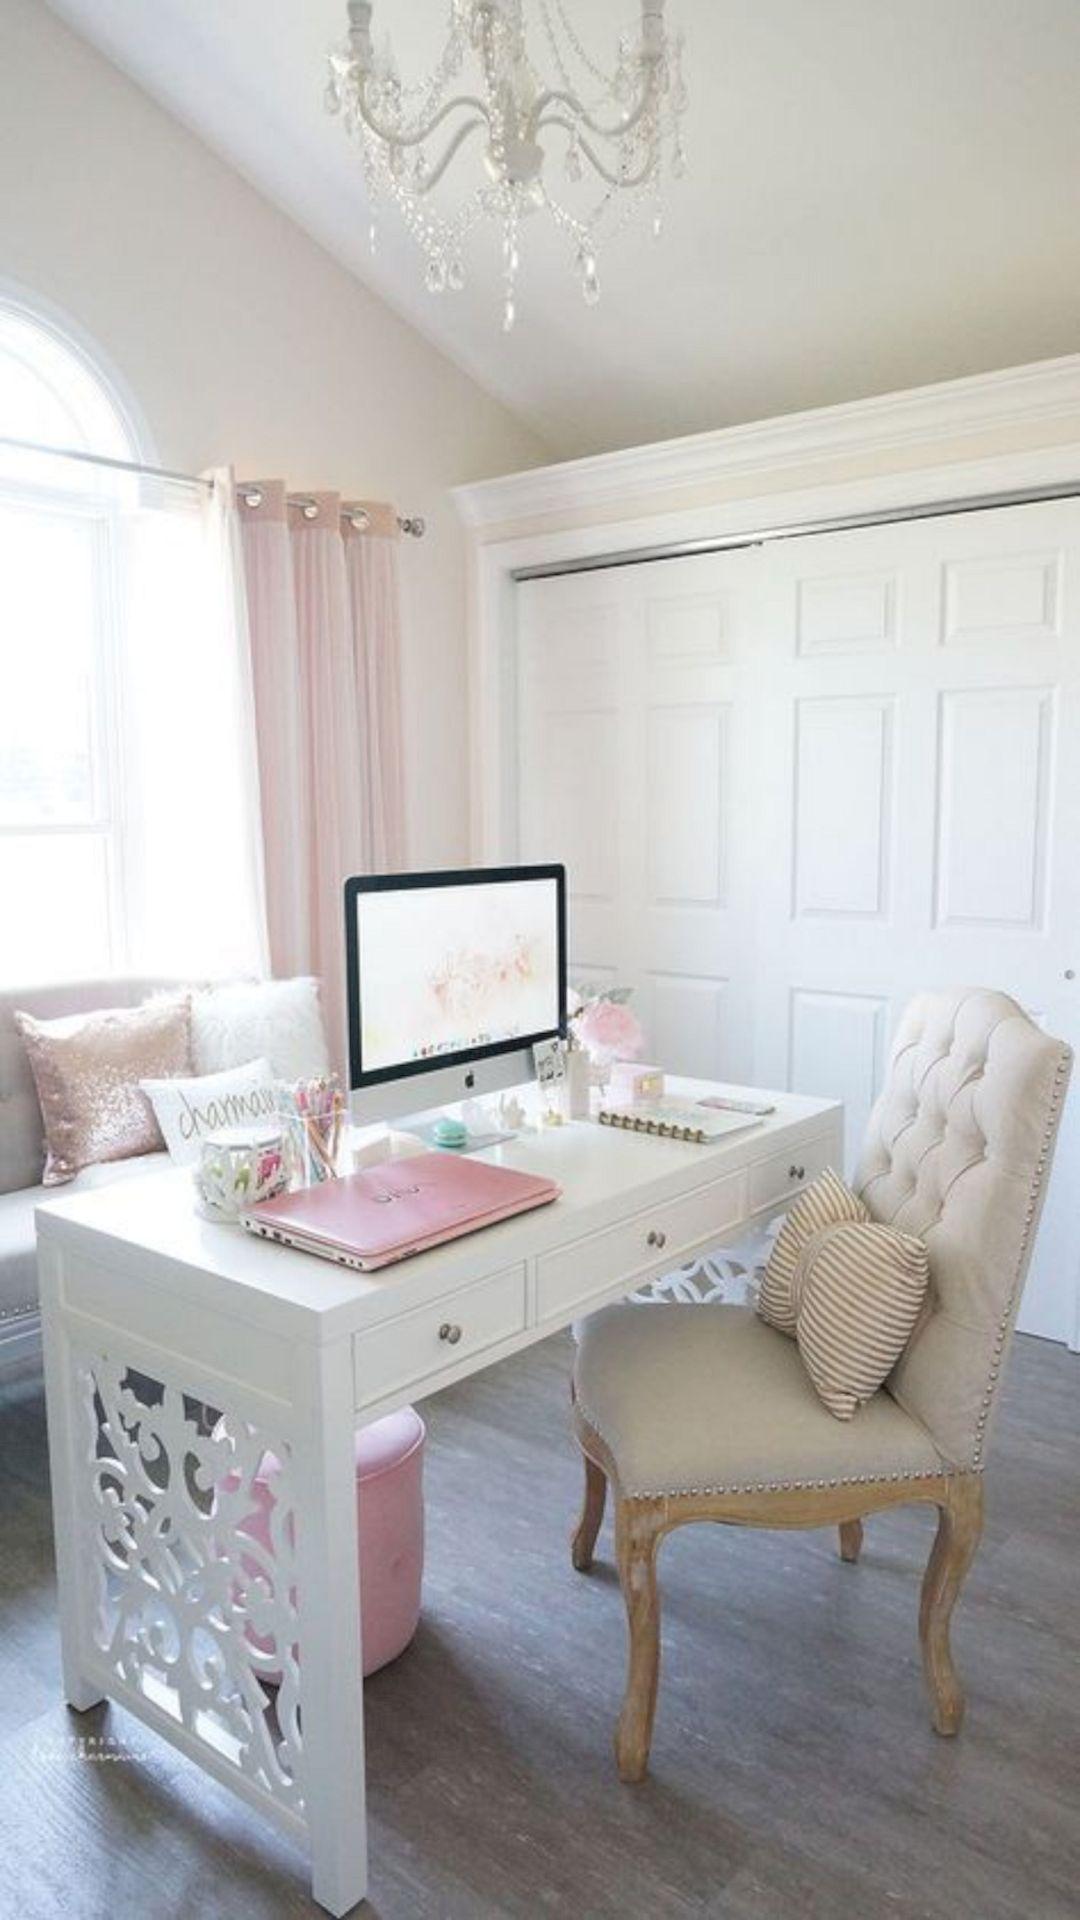 18 Cute Diy Girly Home Decor Ideas Httpswwwfuturistarchitecturecom